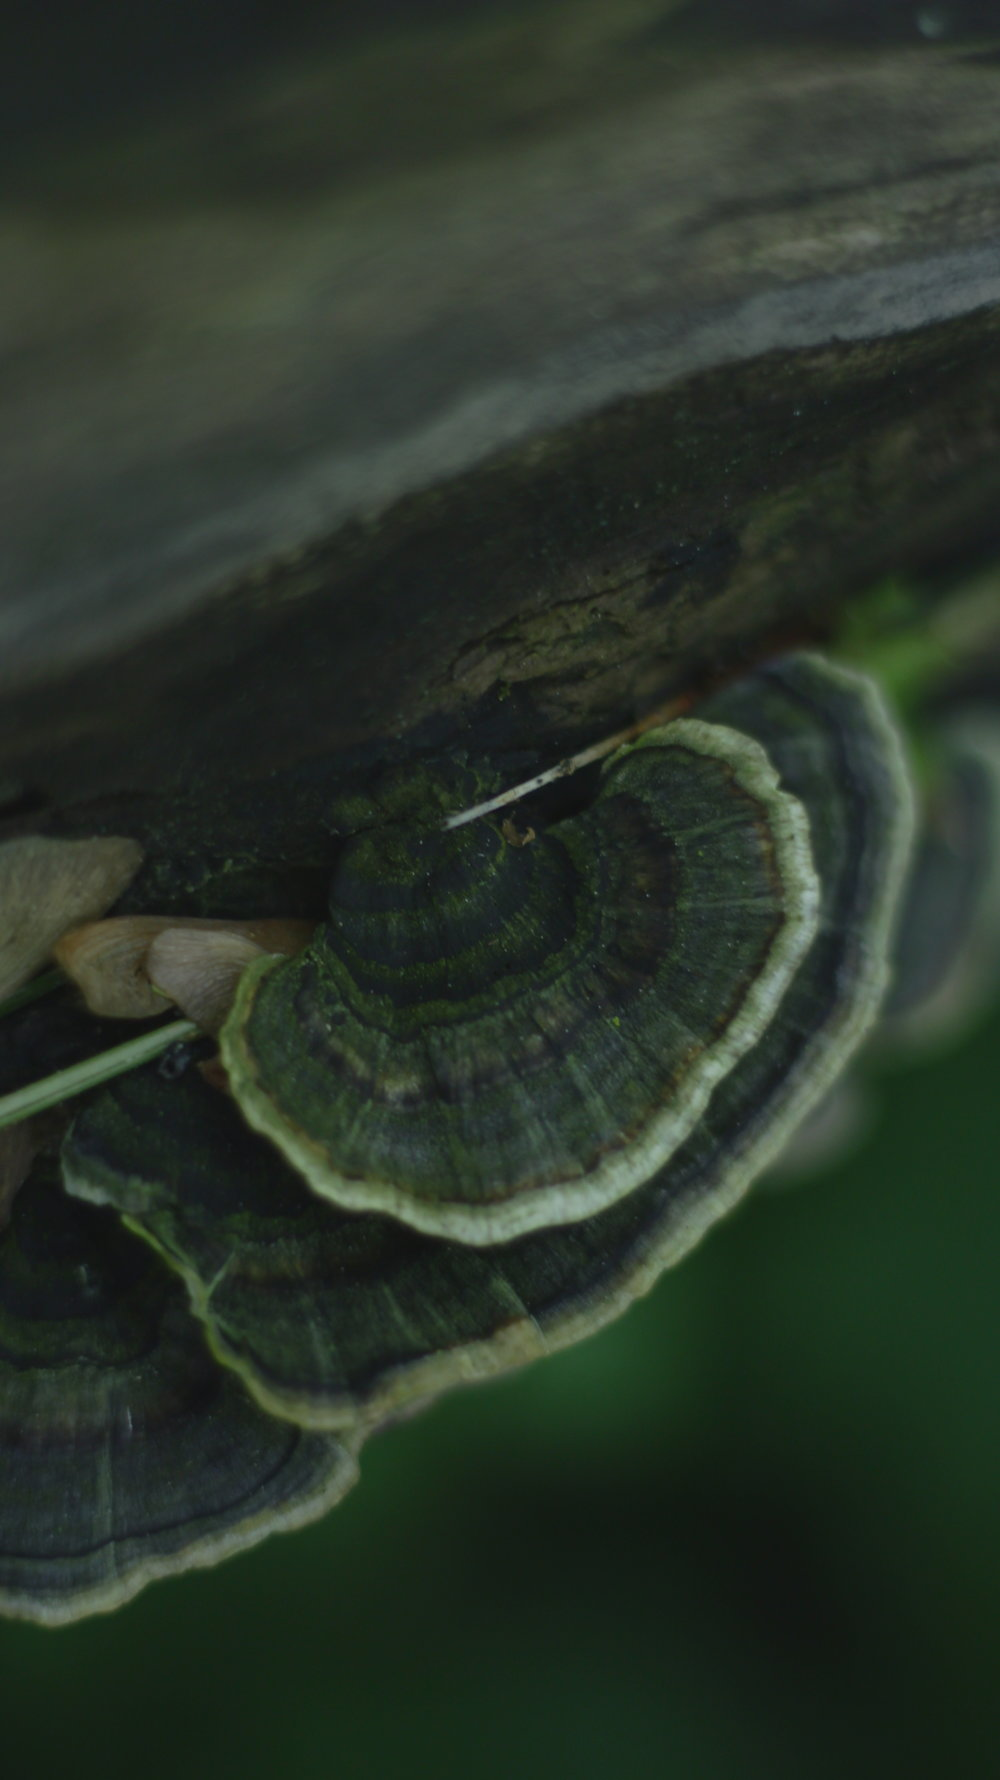 Tramète versicolore (trametes versicolor)